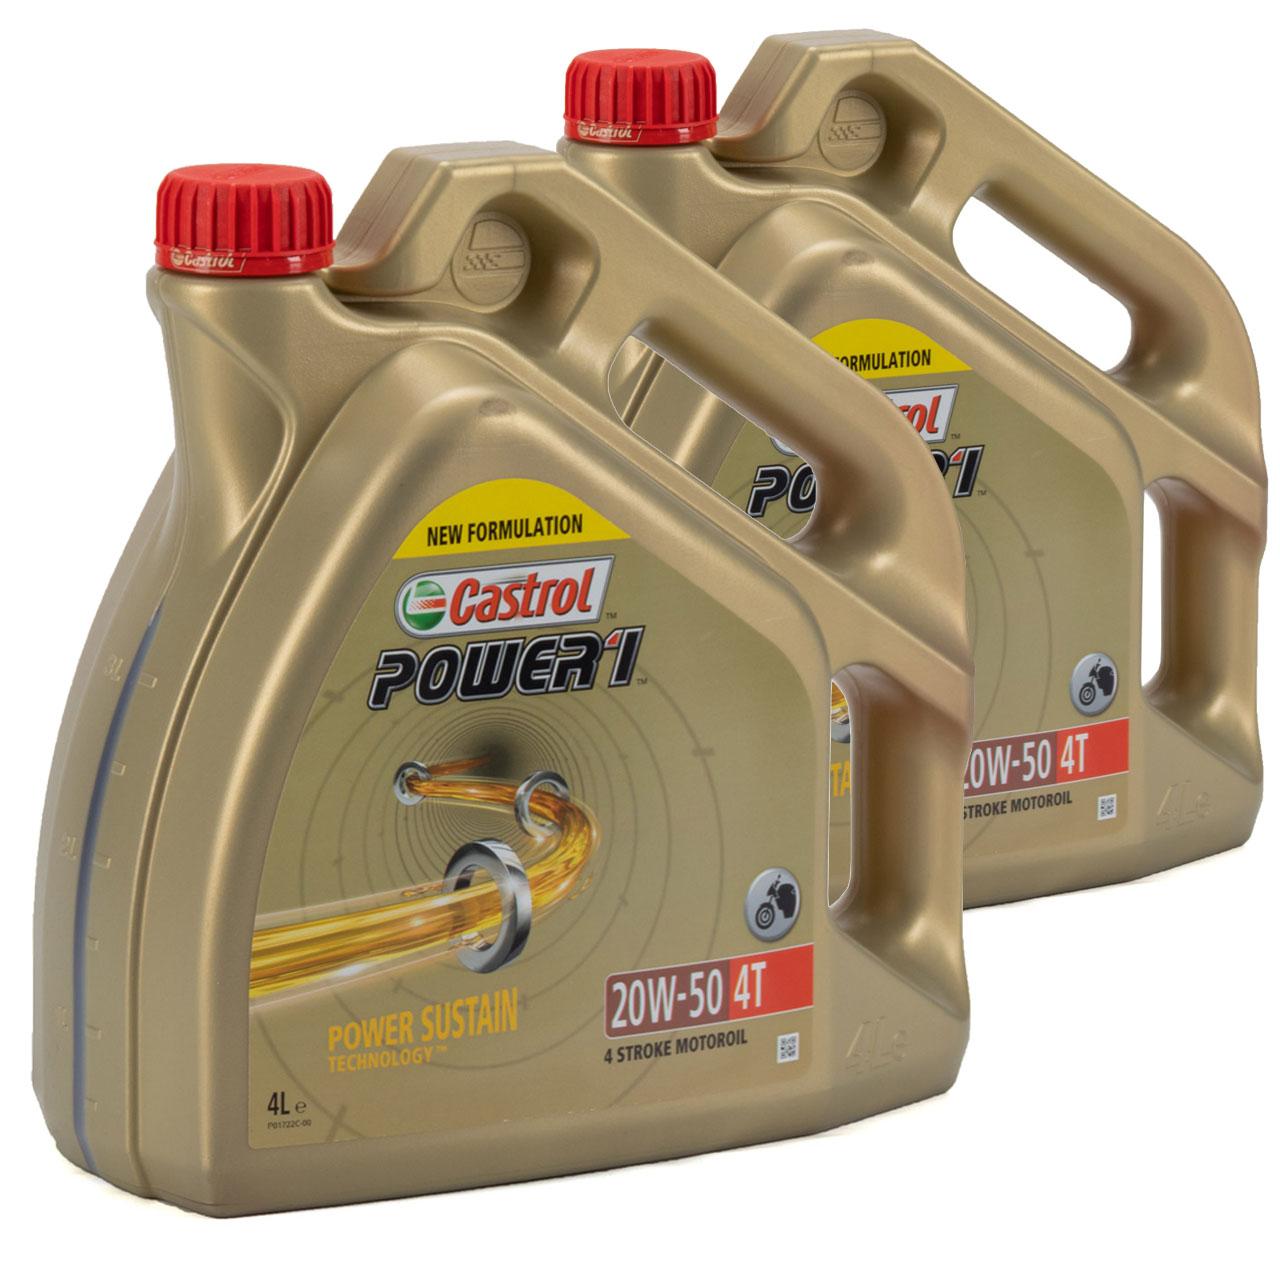 CASTROL Motoröl Öl POWER 1 20W-50 4T 4-TAKT Motorrad API SN JASO MA-2 - 8 Liter